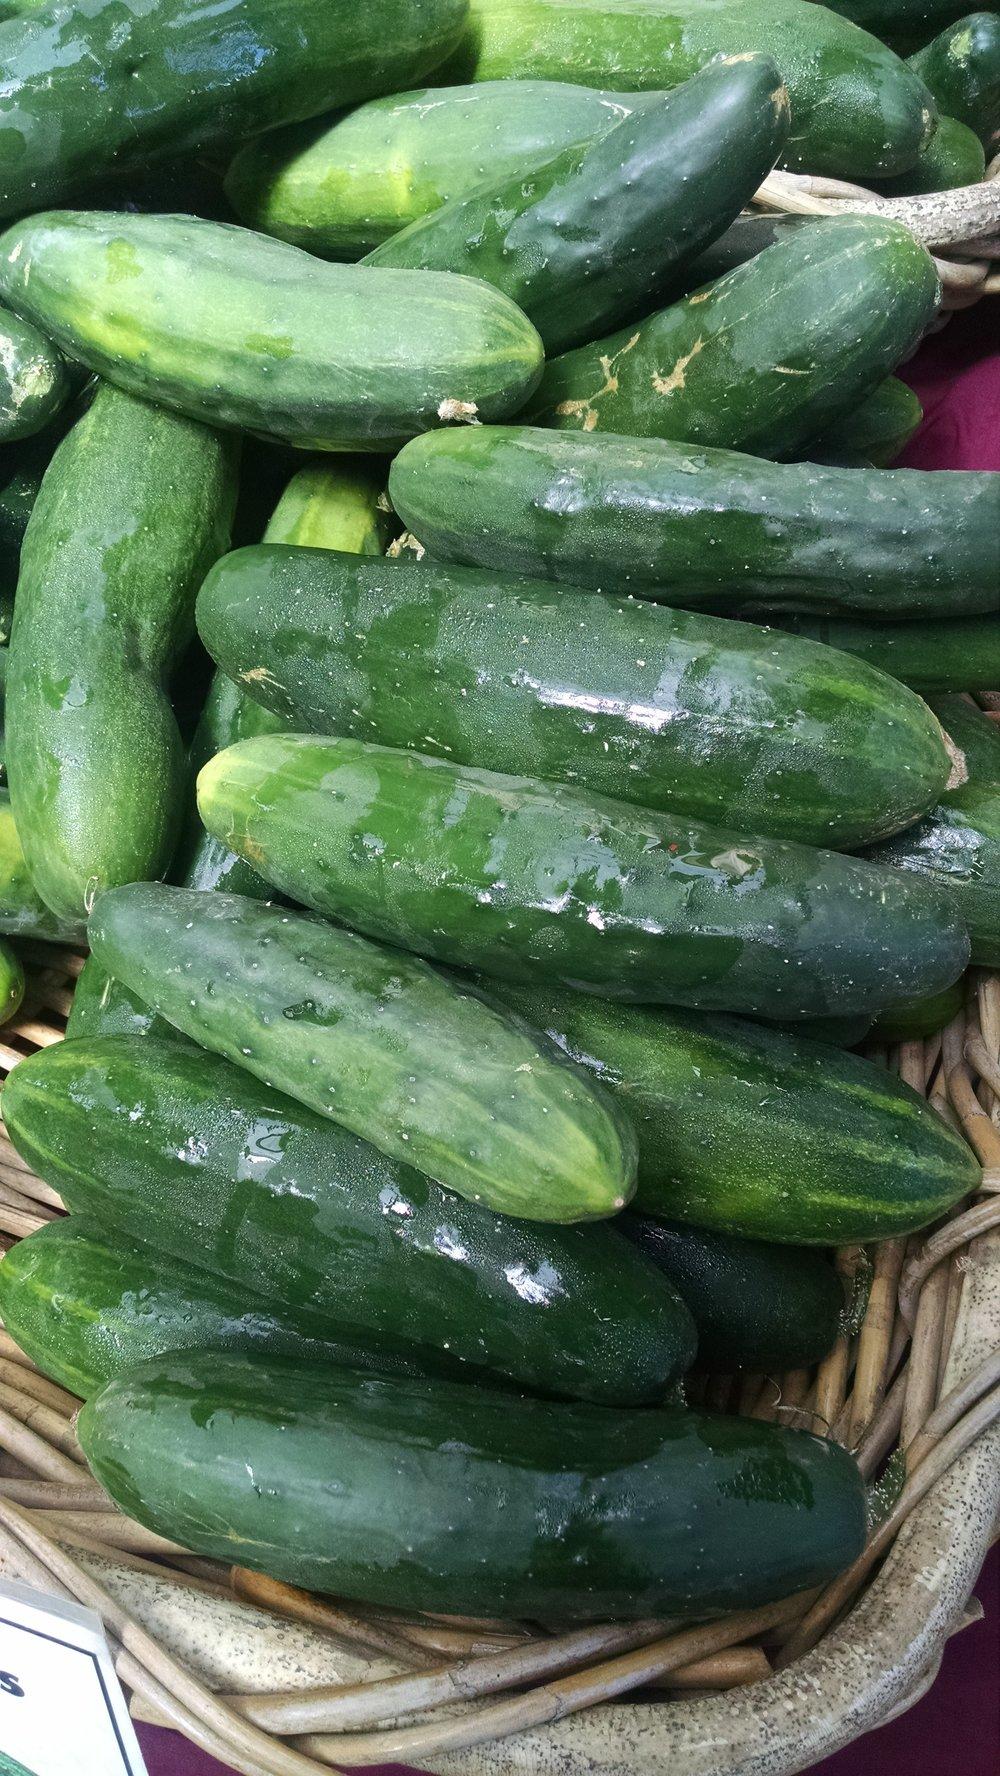 Cucumbers finally flowing